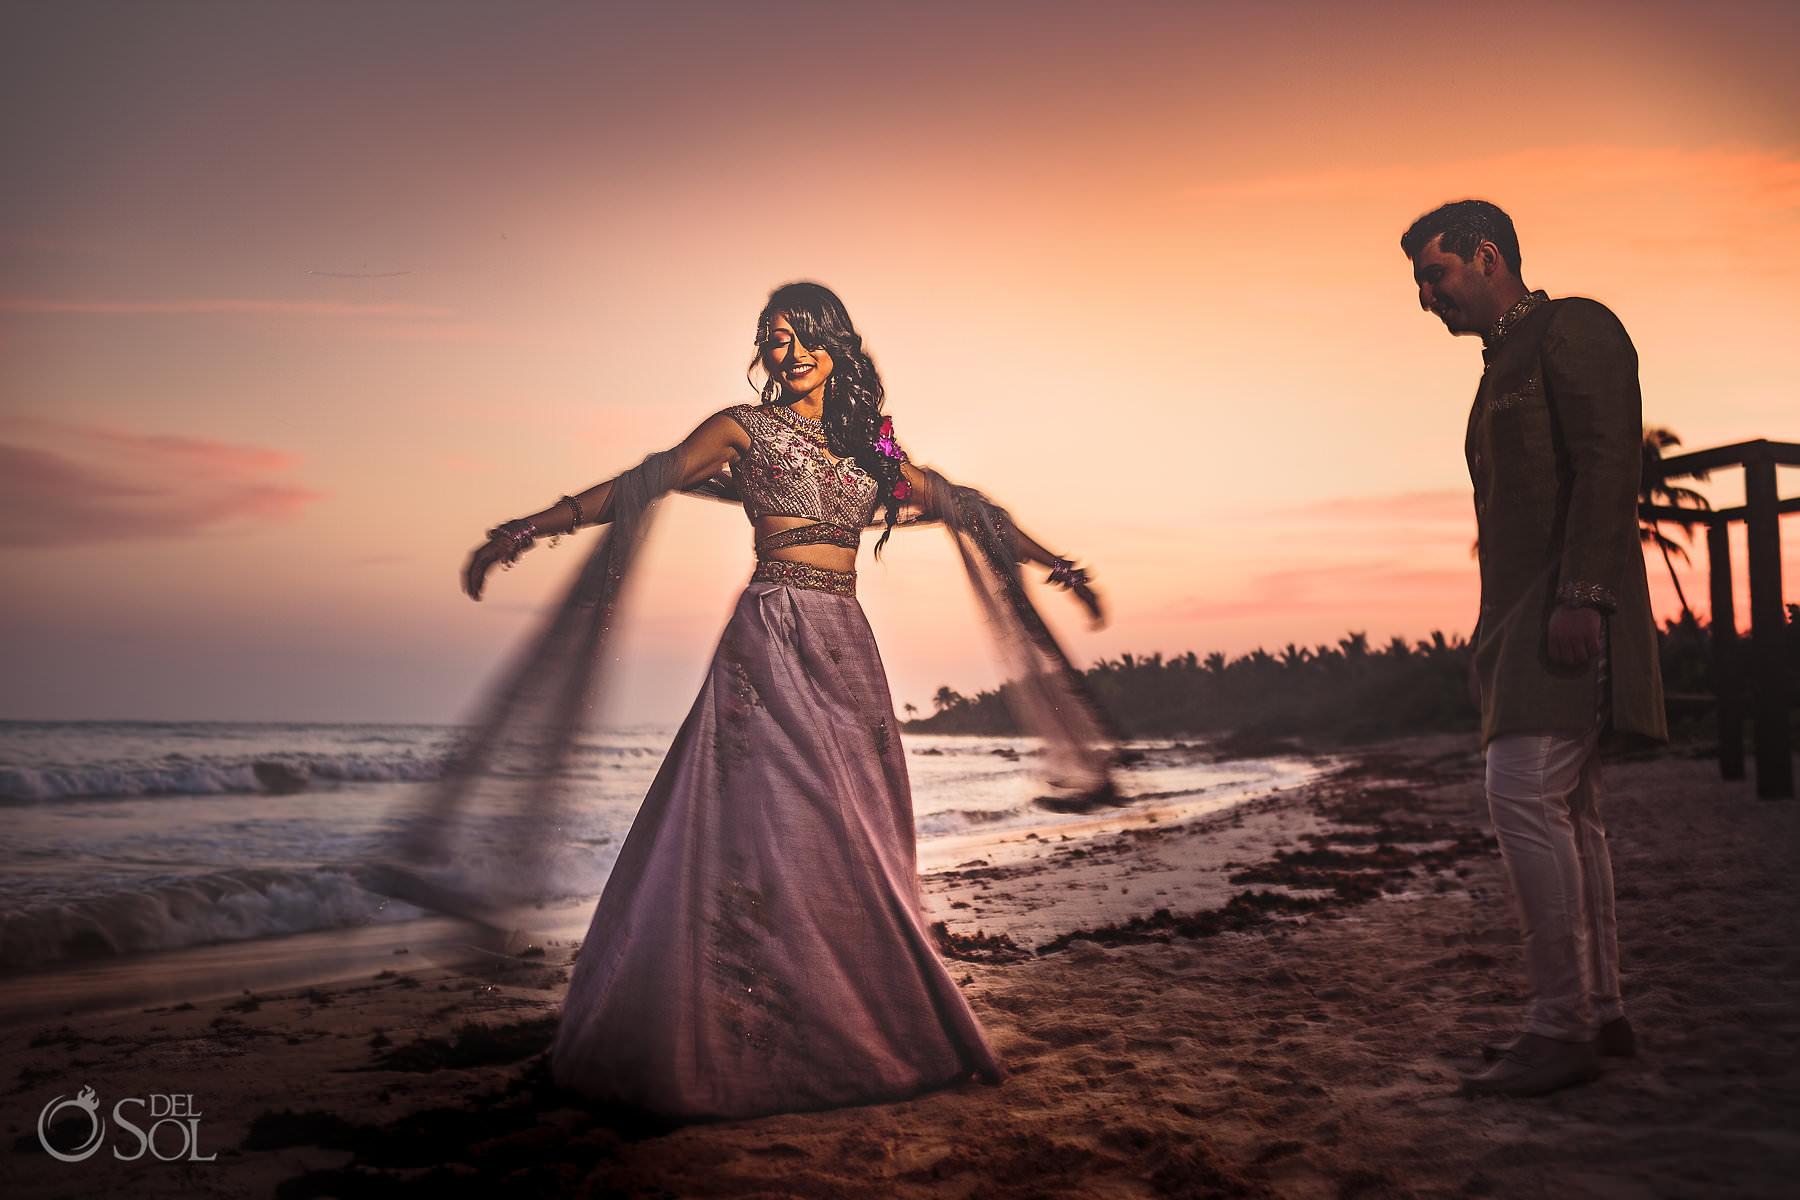 South Asian wedding portrait Dreams Tulum beach pink lehenga